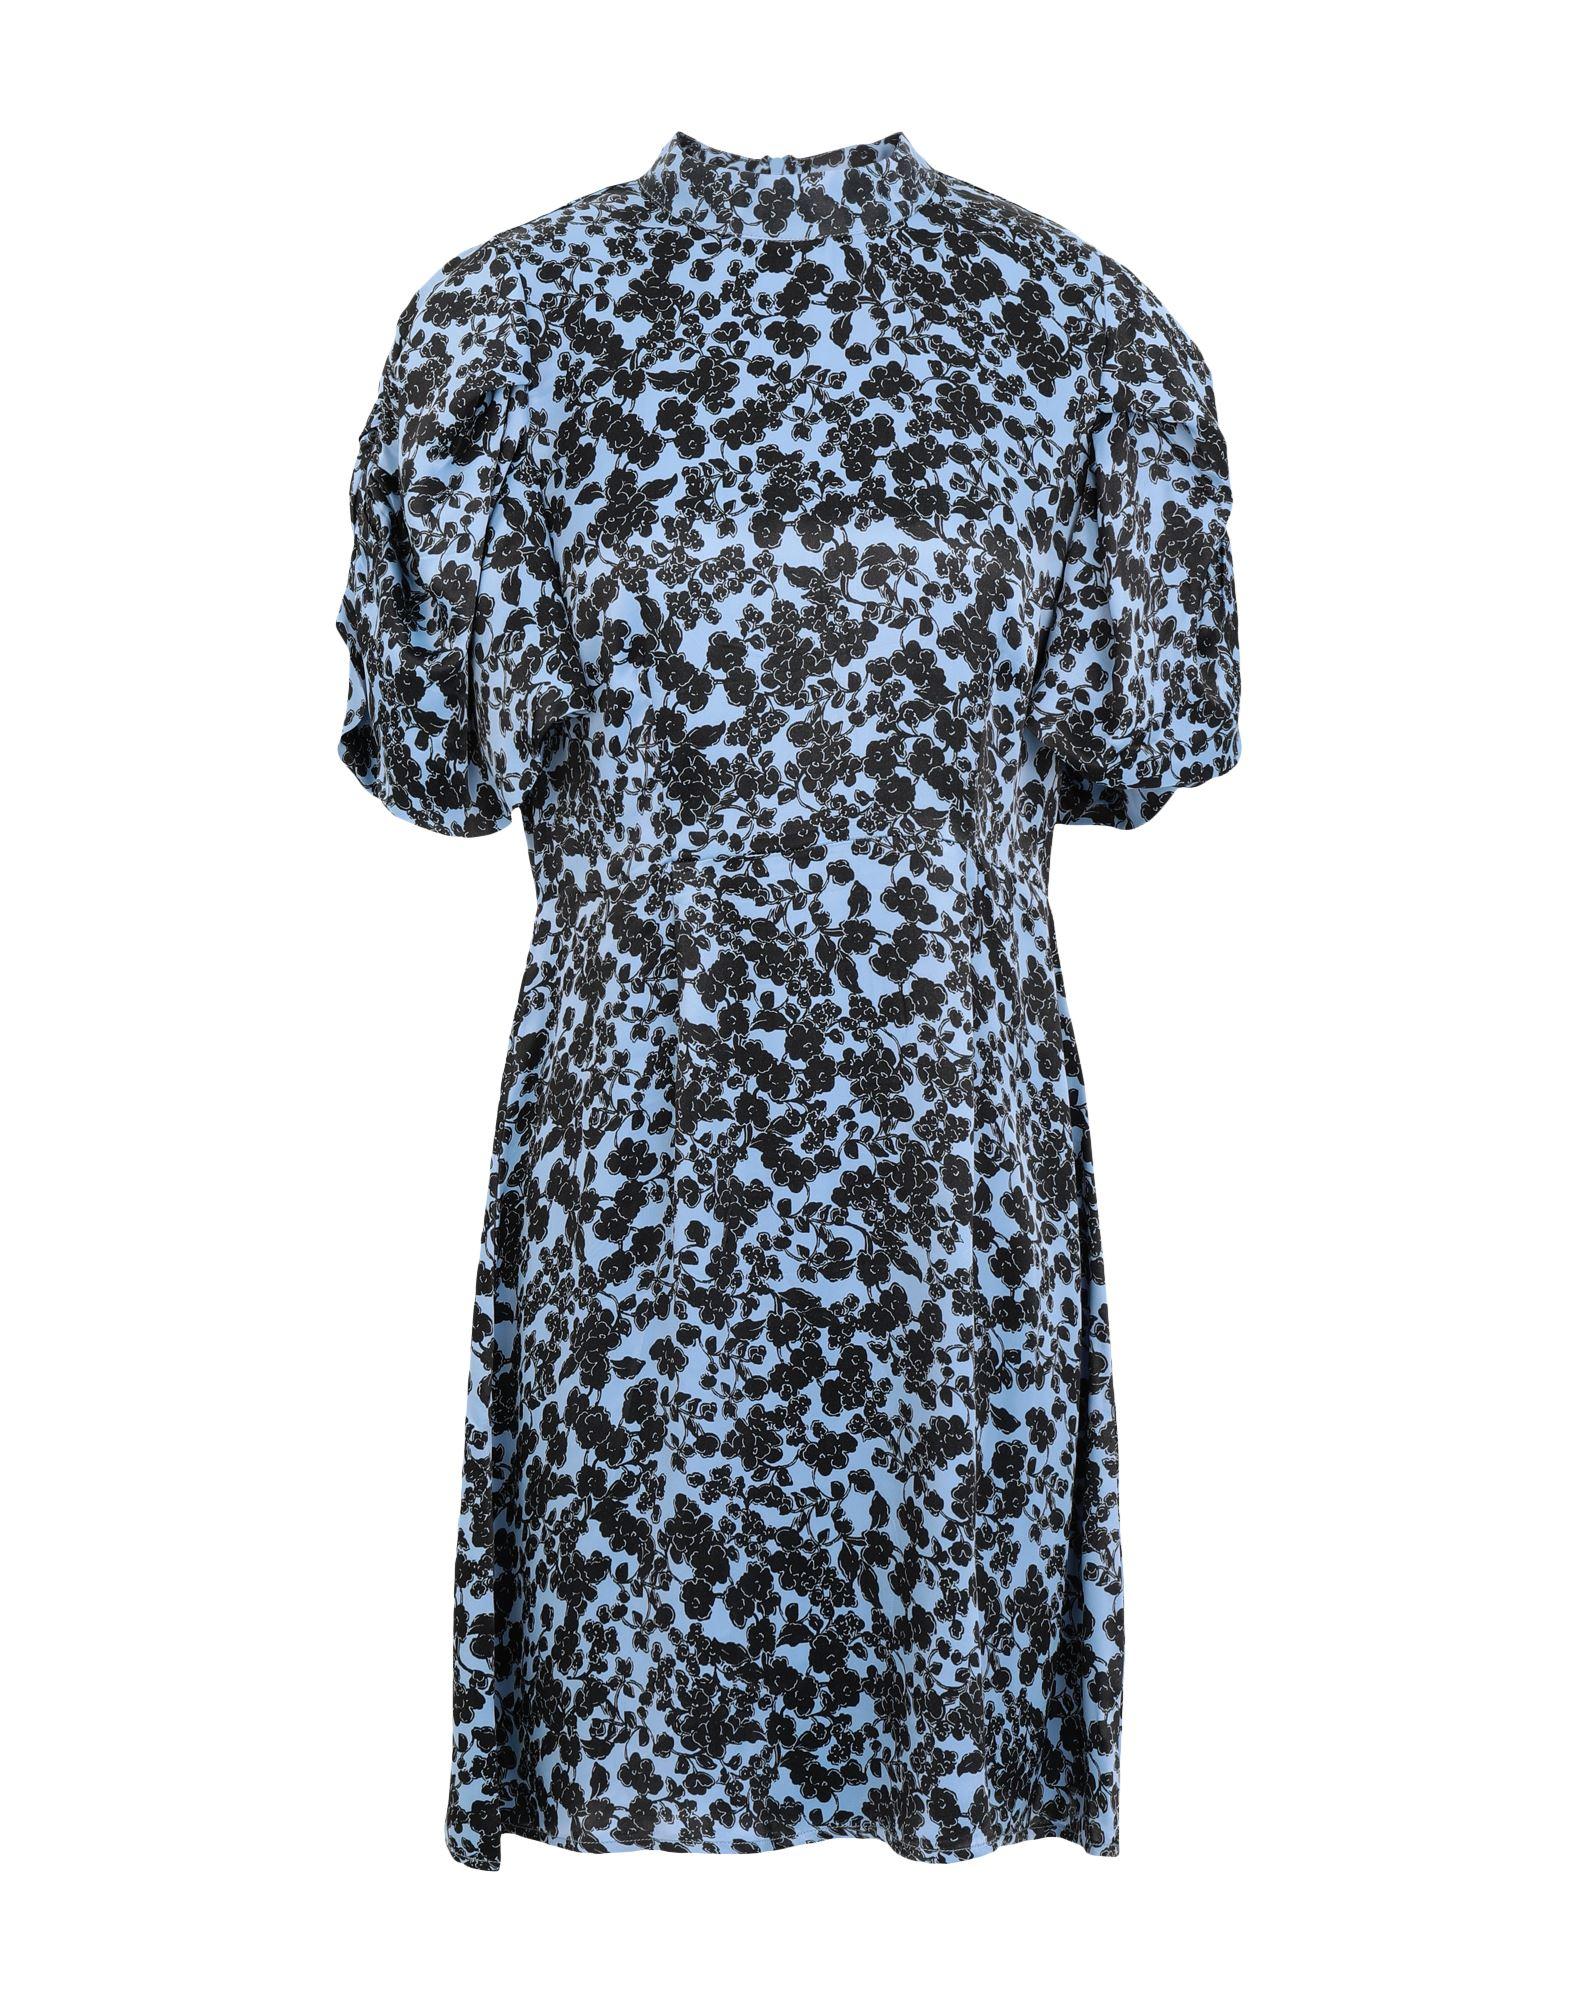 VERO MODA Короткое платье фото